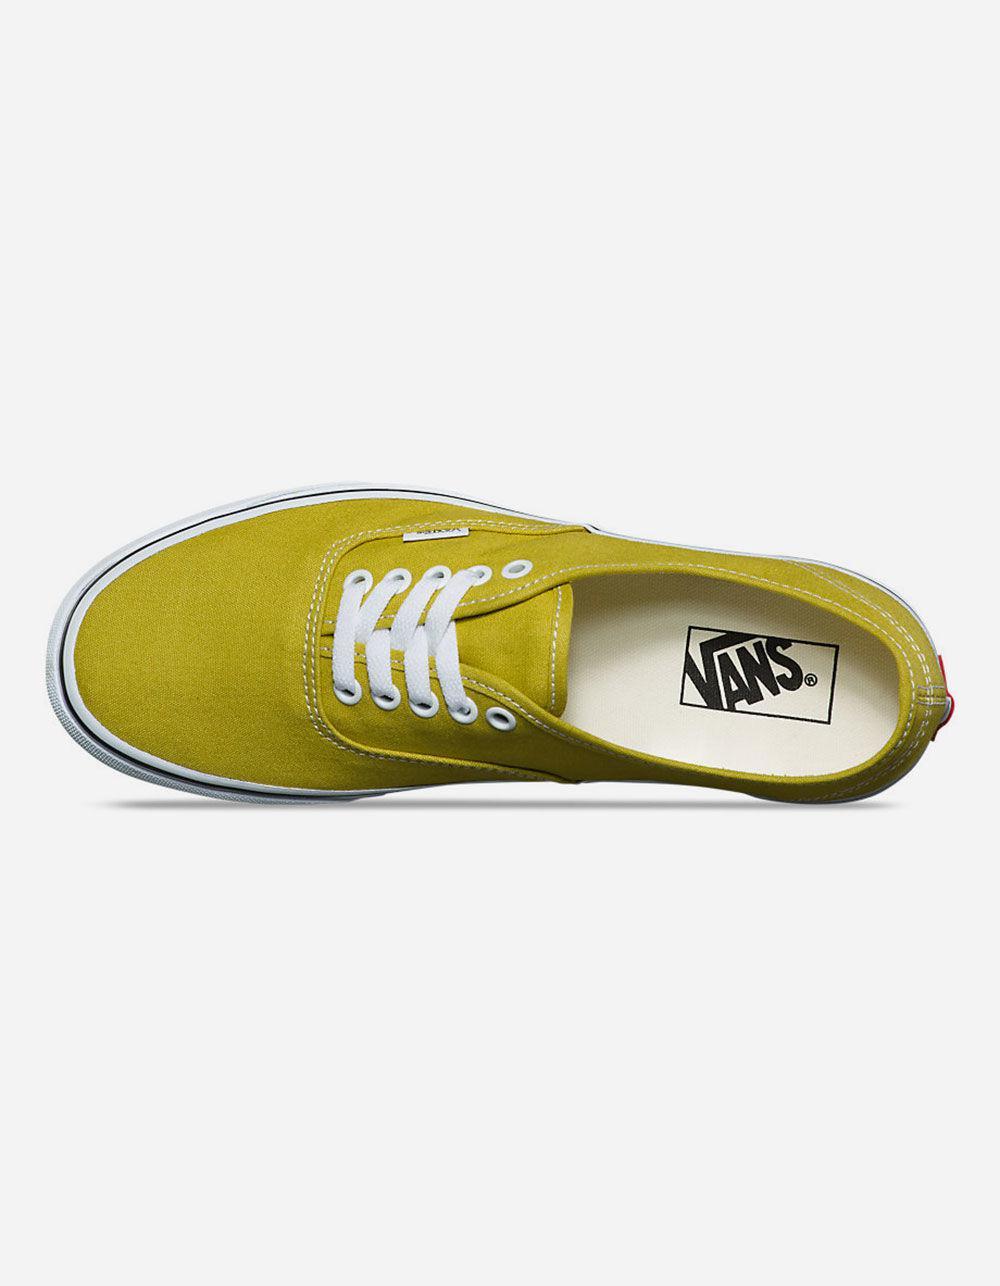 ef01cd9b56 Vans - Multicolor Authentic Cress Green   True White Mens Shoes for Men -  Lyst. View fullscreen